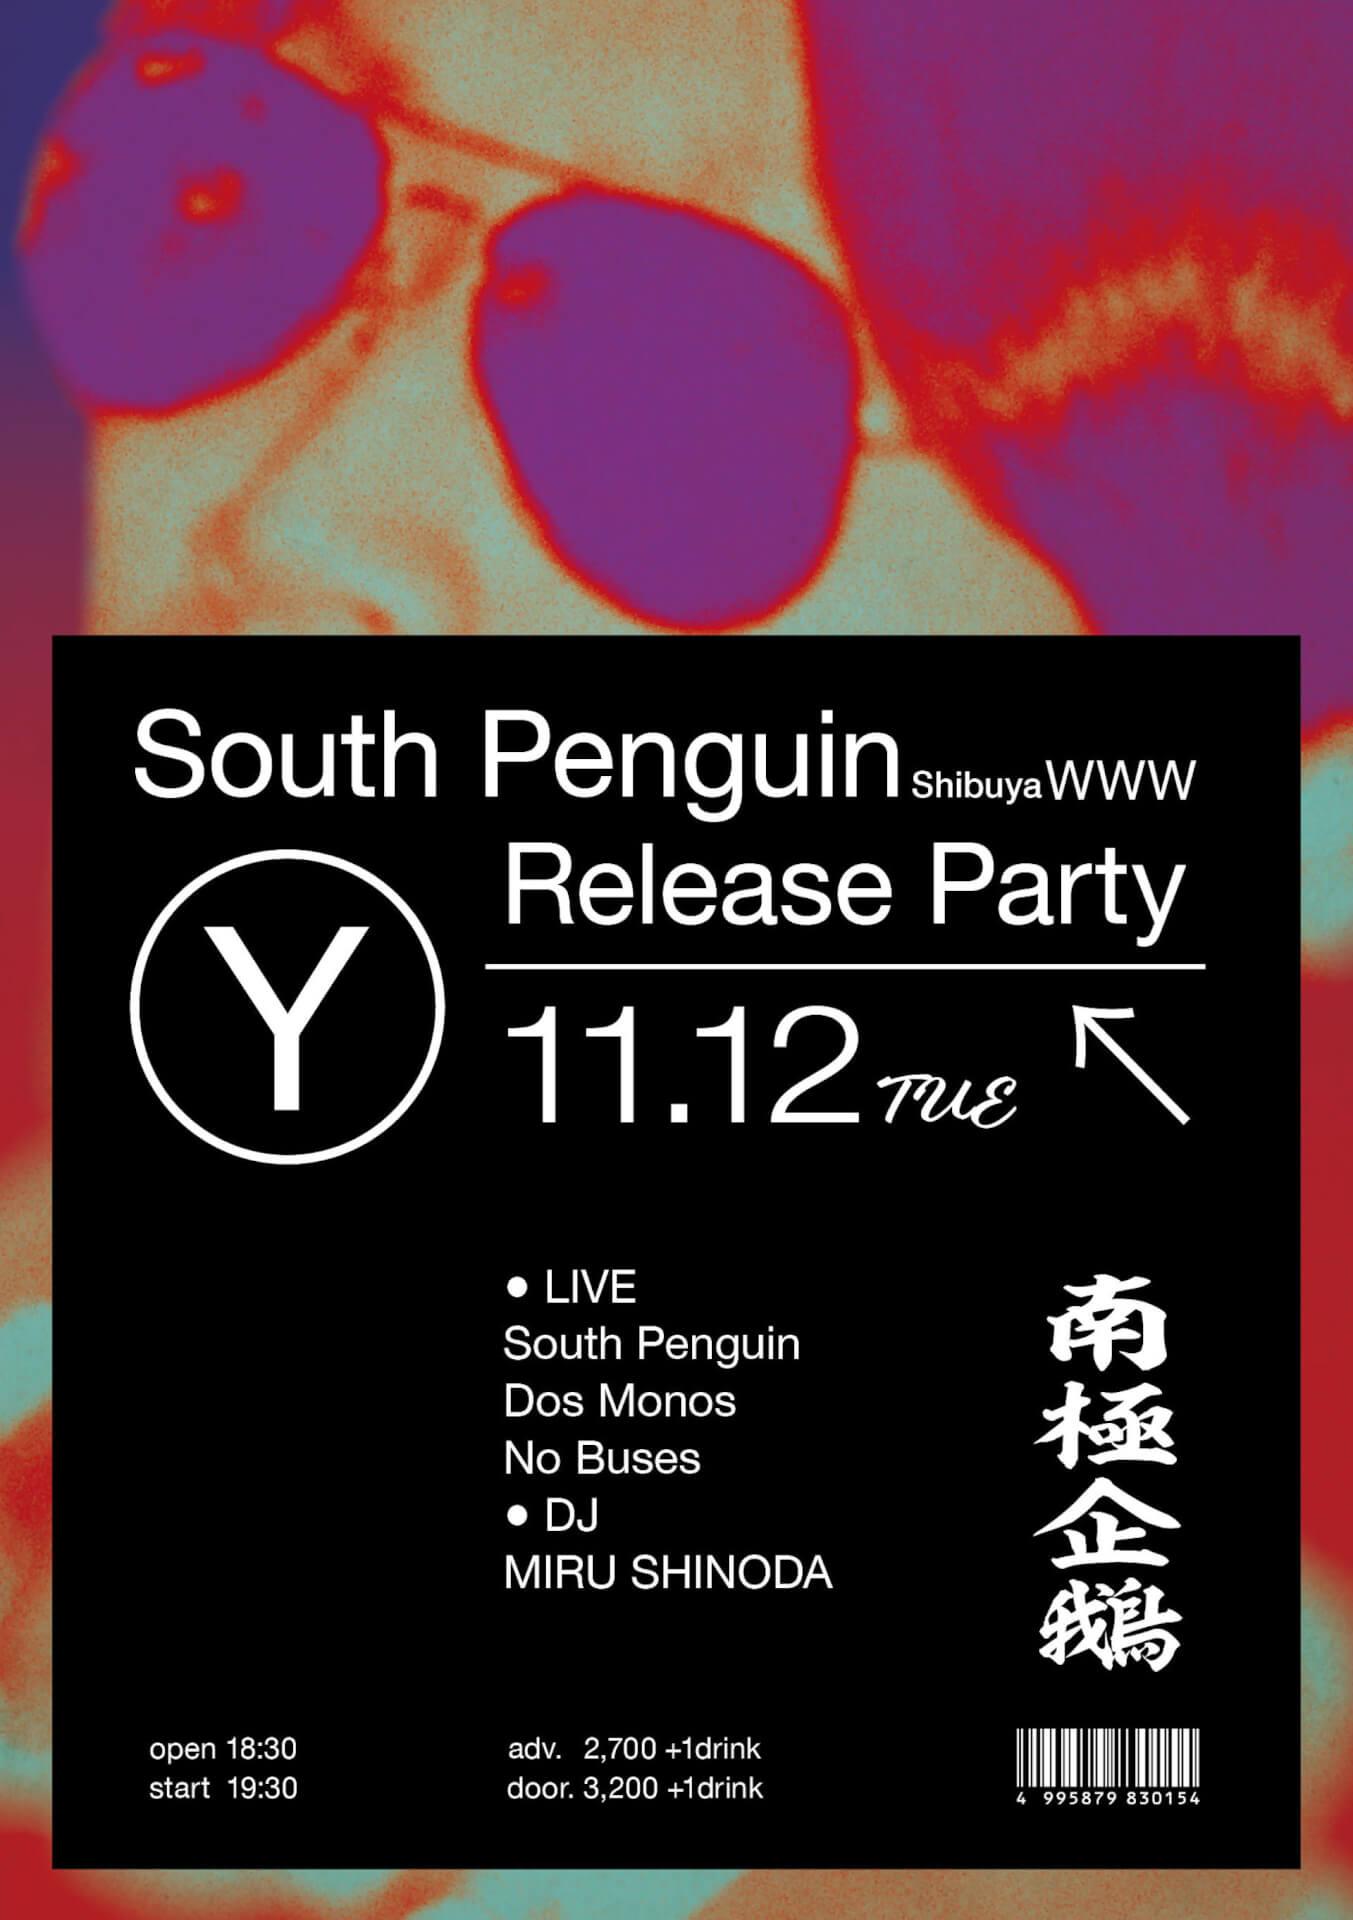 South Penguin、ファーストアルバム『Y』のリリースパーティーが11月に開催|ゲストにDos Monos、No Buses、MIRU SHINODAが登場 music190902-southpenguin-2